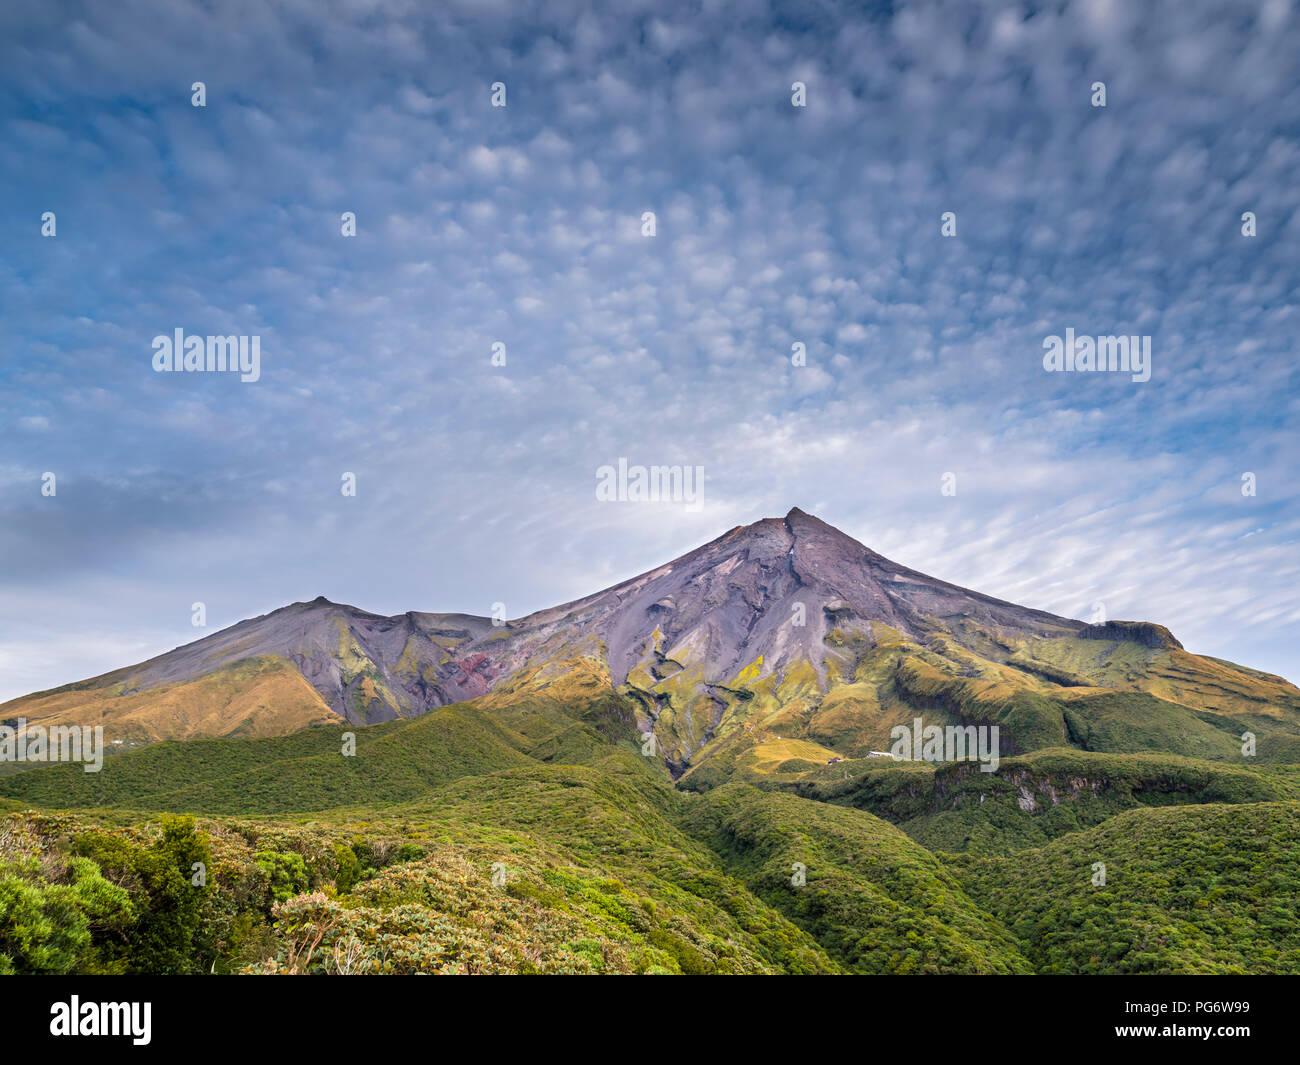 New Zealand, North Island, Egmont National Park, view to Mount Taranaki - Stock Image